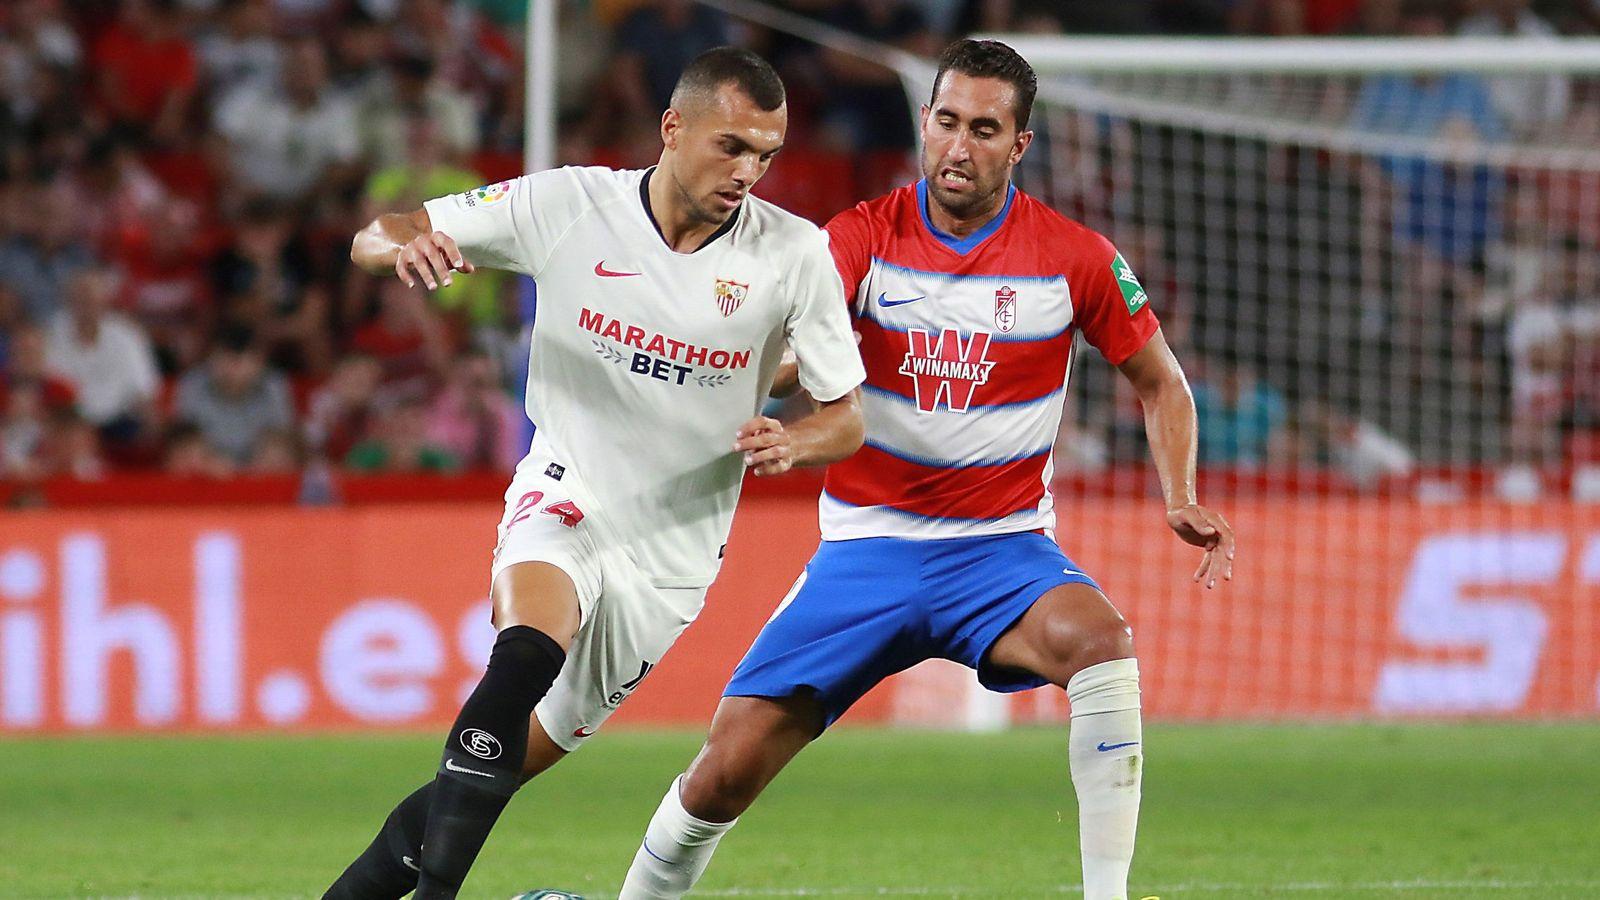 Foto: Joan Jordán marcó el gol de la victoria del Sevilla en Granada. (EFE)